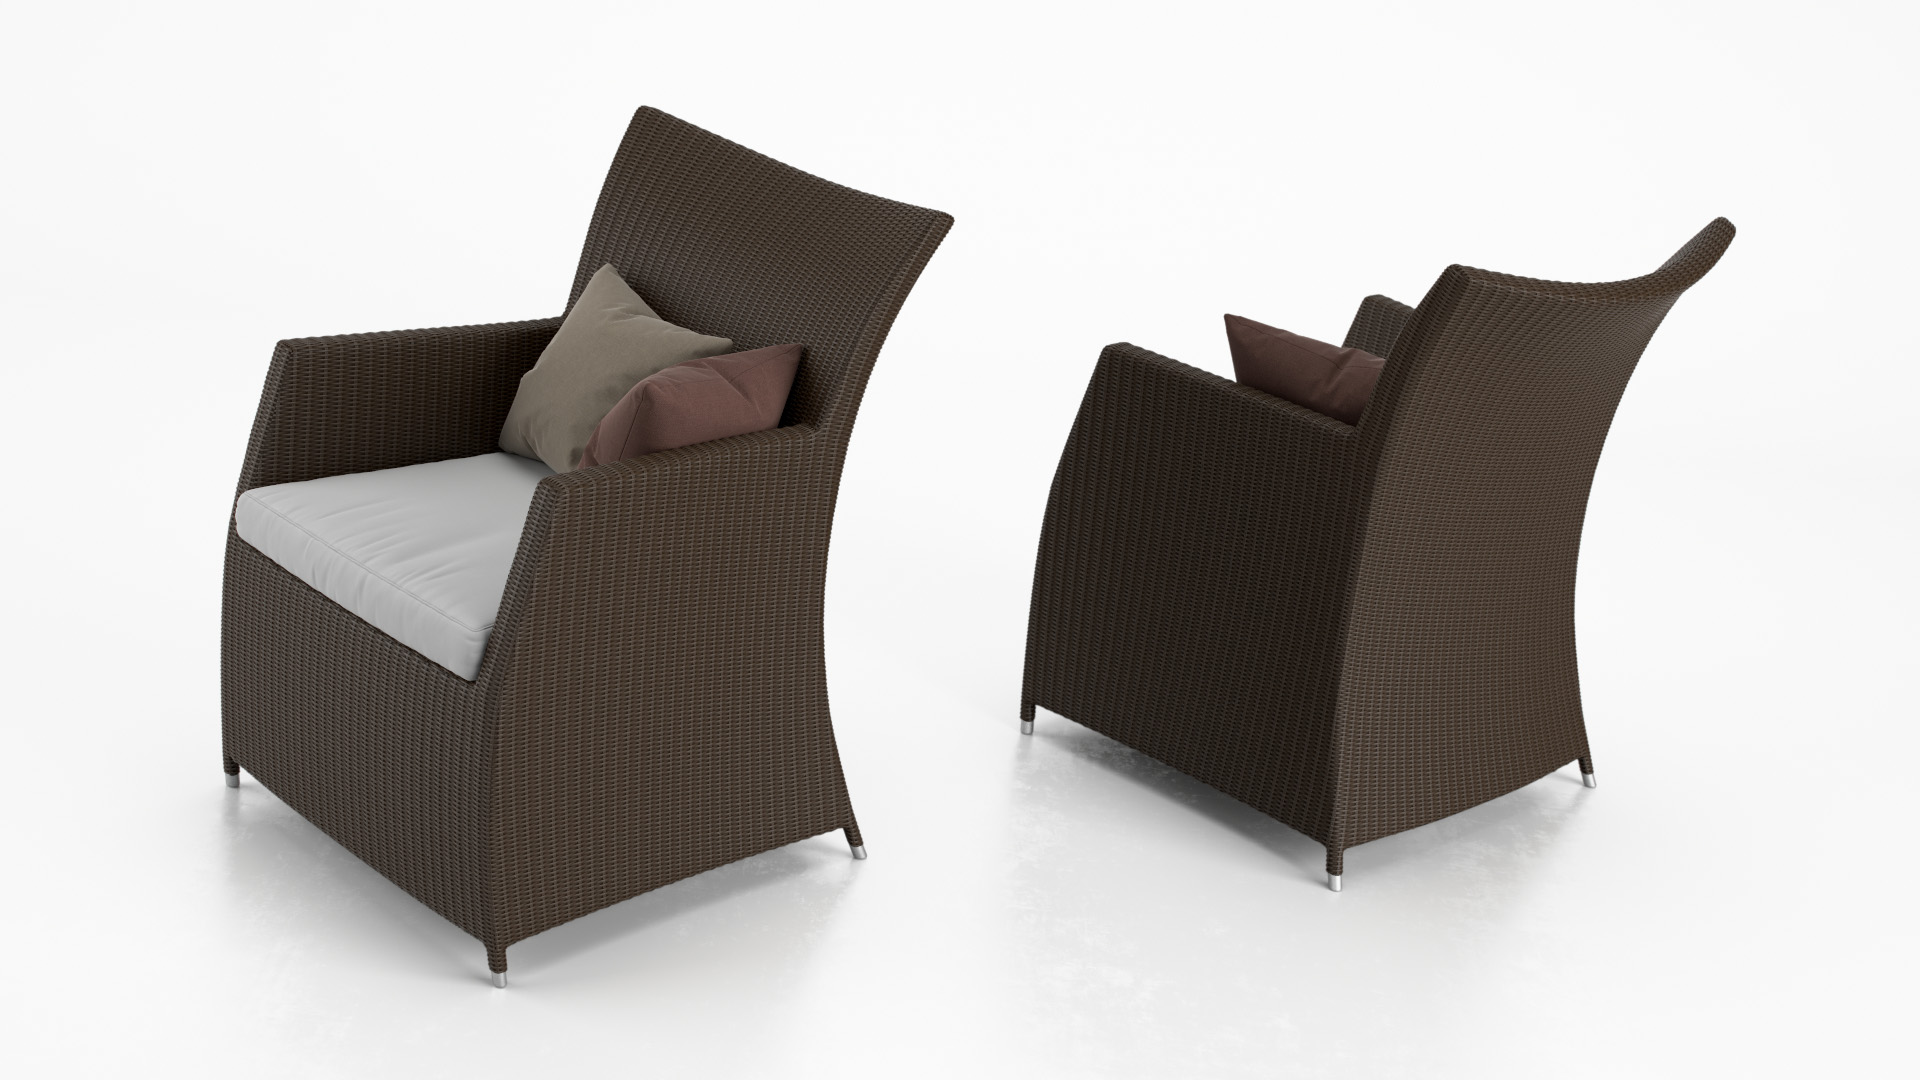 U-zit_Chair_CF-21-DB_WhiteSet_01_0003